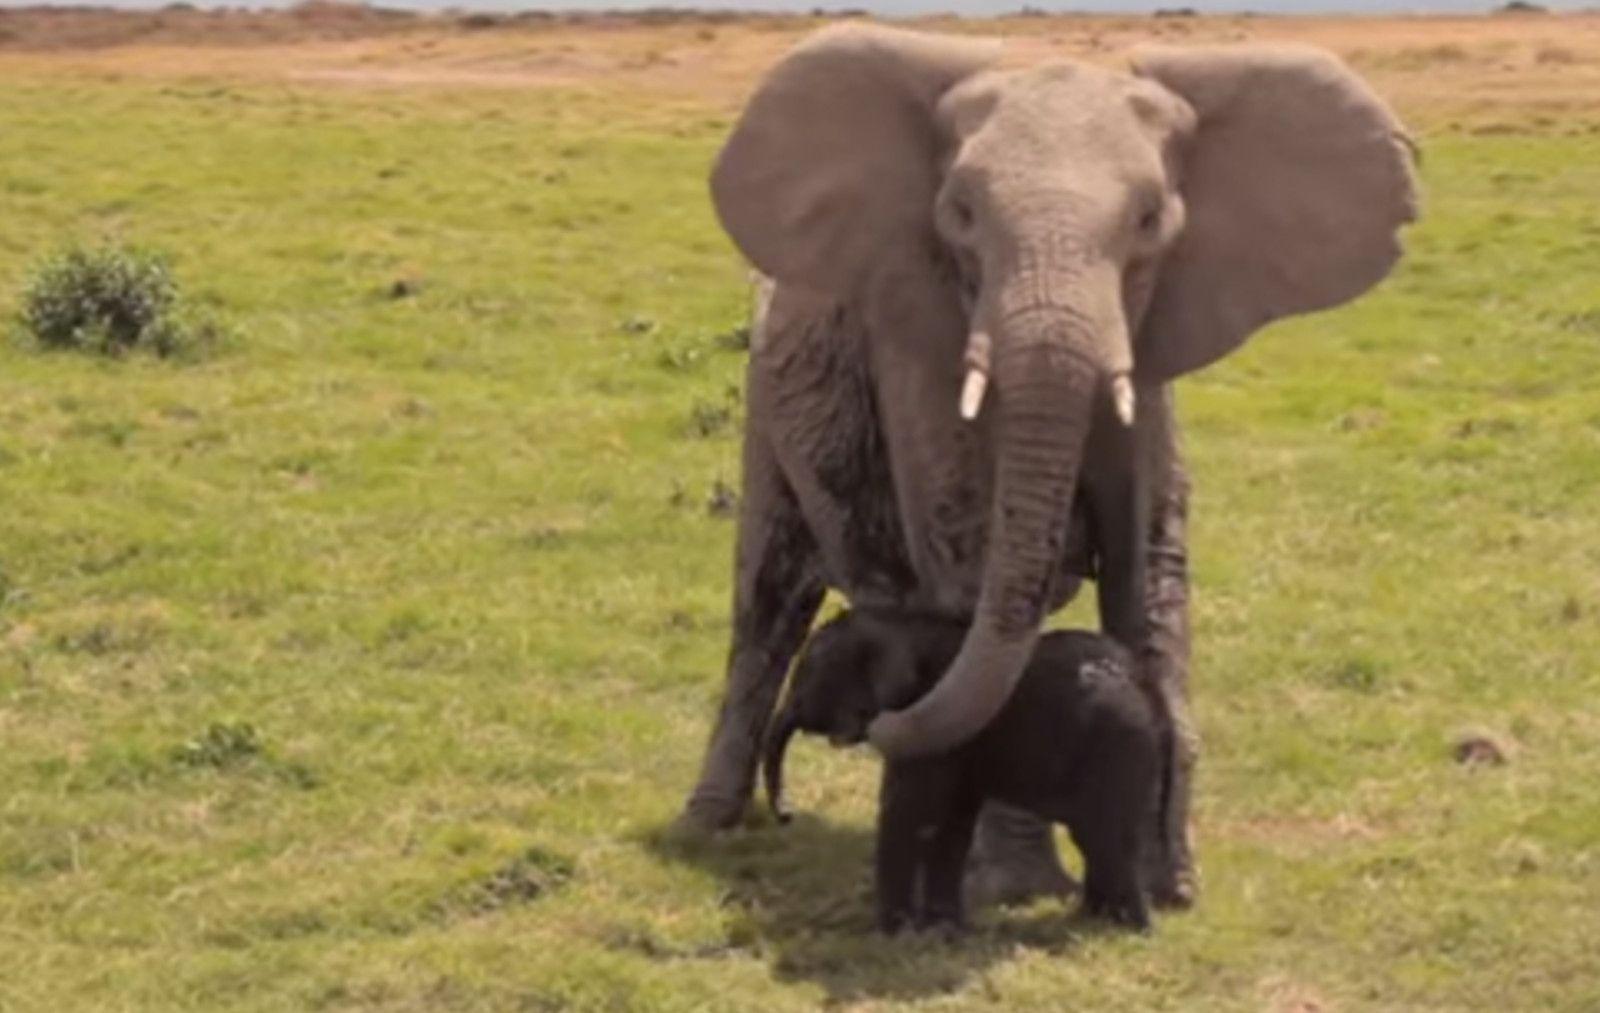 Elephant Superheroes Great Organizations Saving Elephants